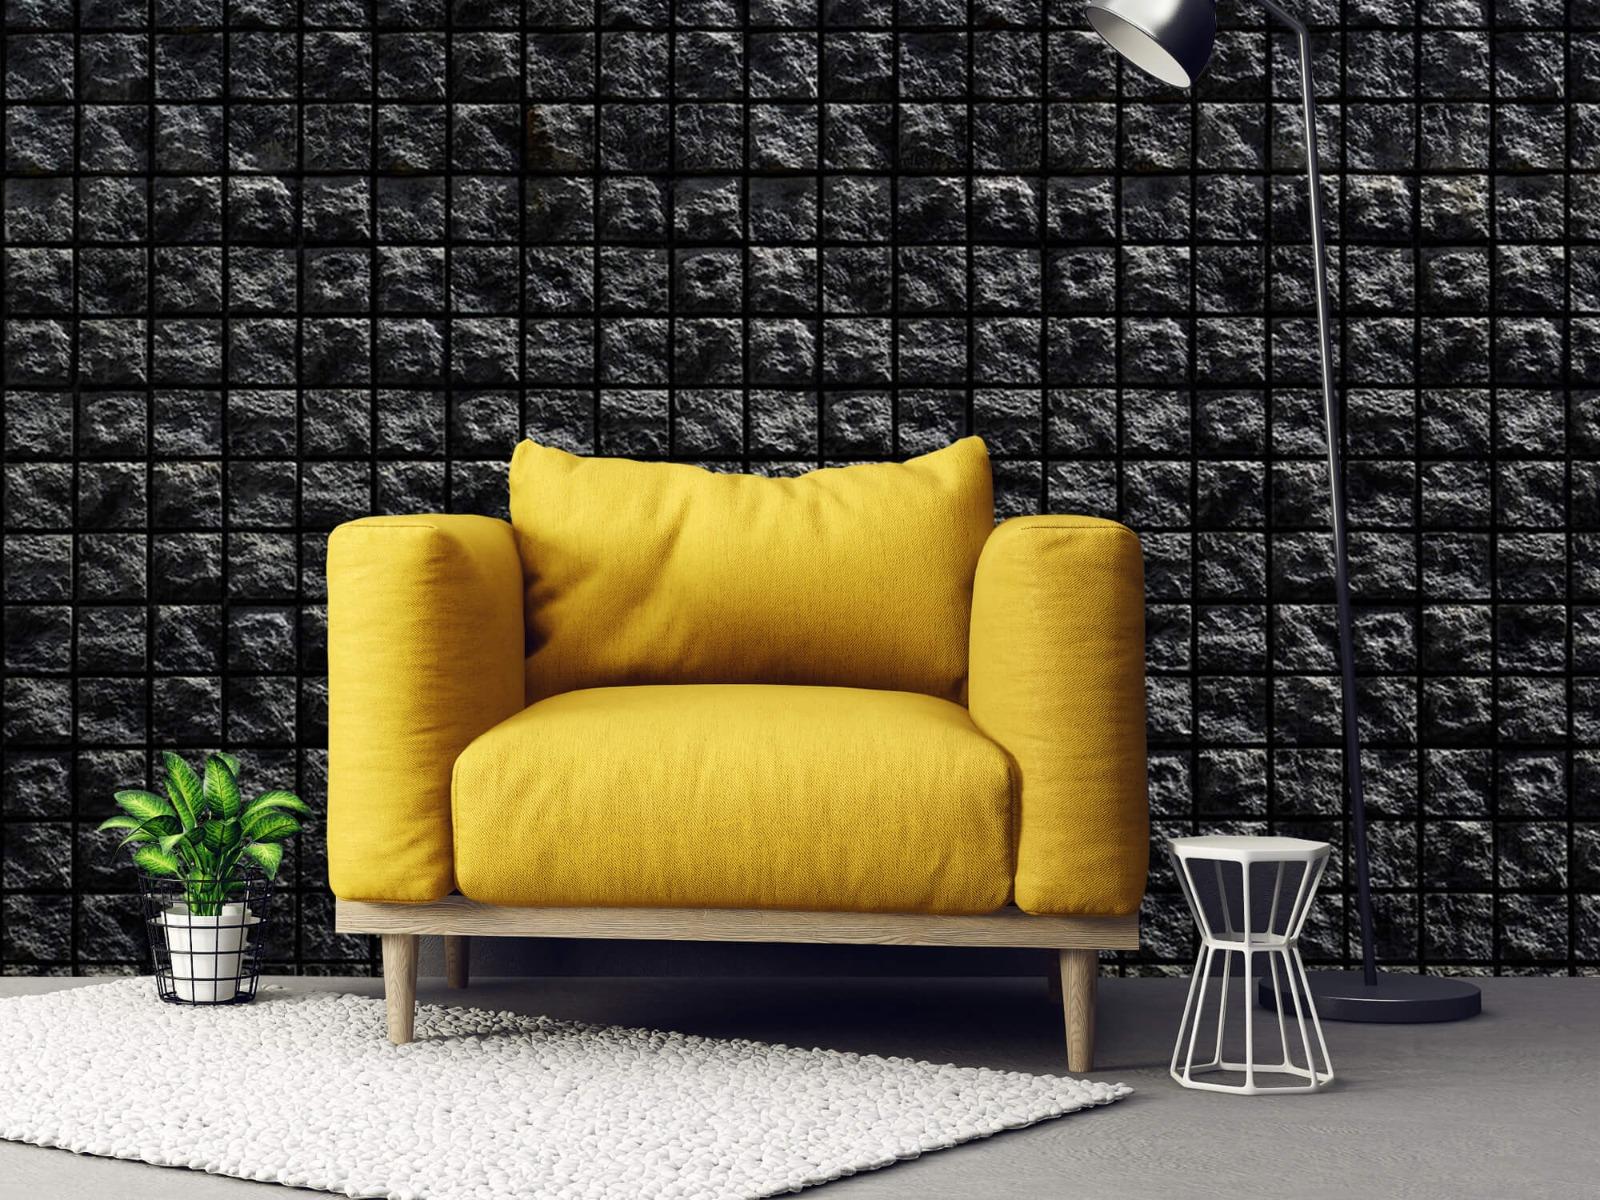 Tegel behang - Vierkante zwarte stenen - Wallexclusive - Woonkamer 21